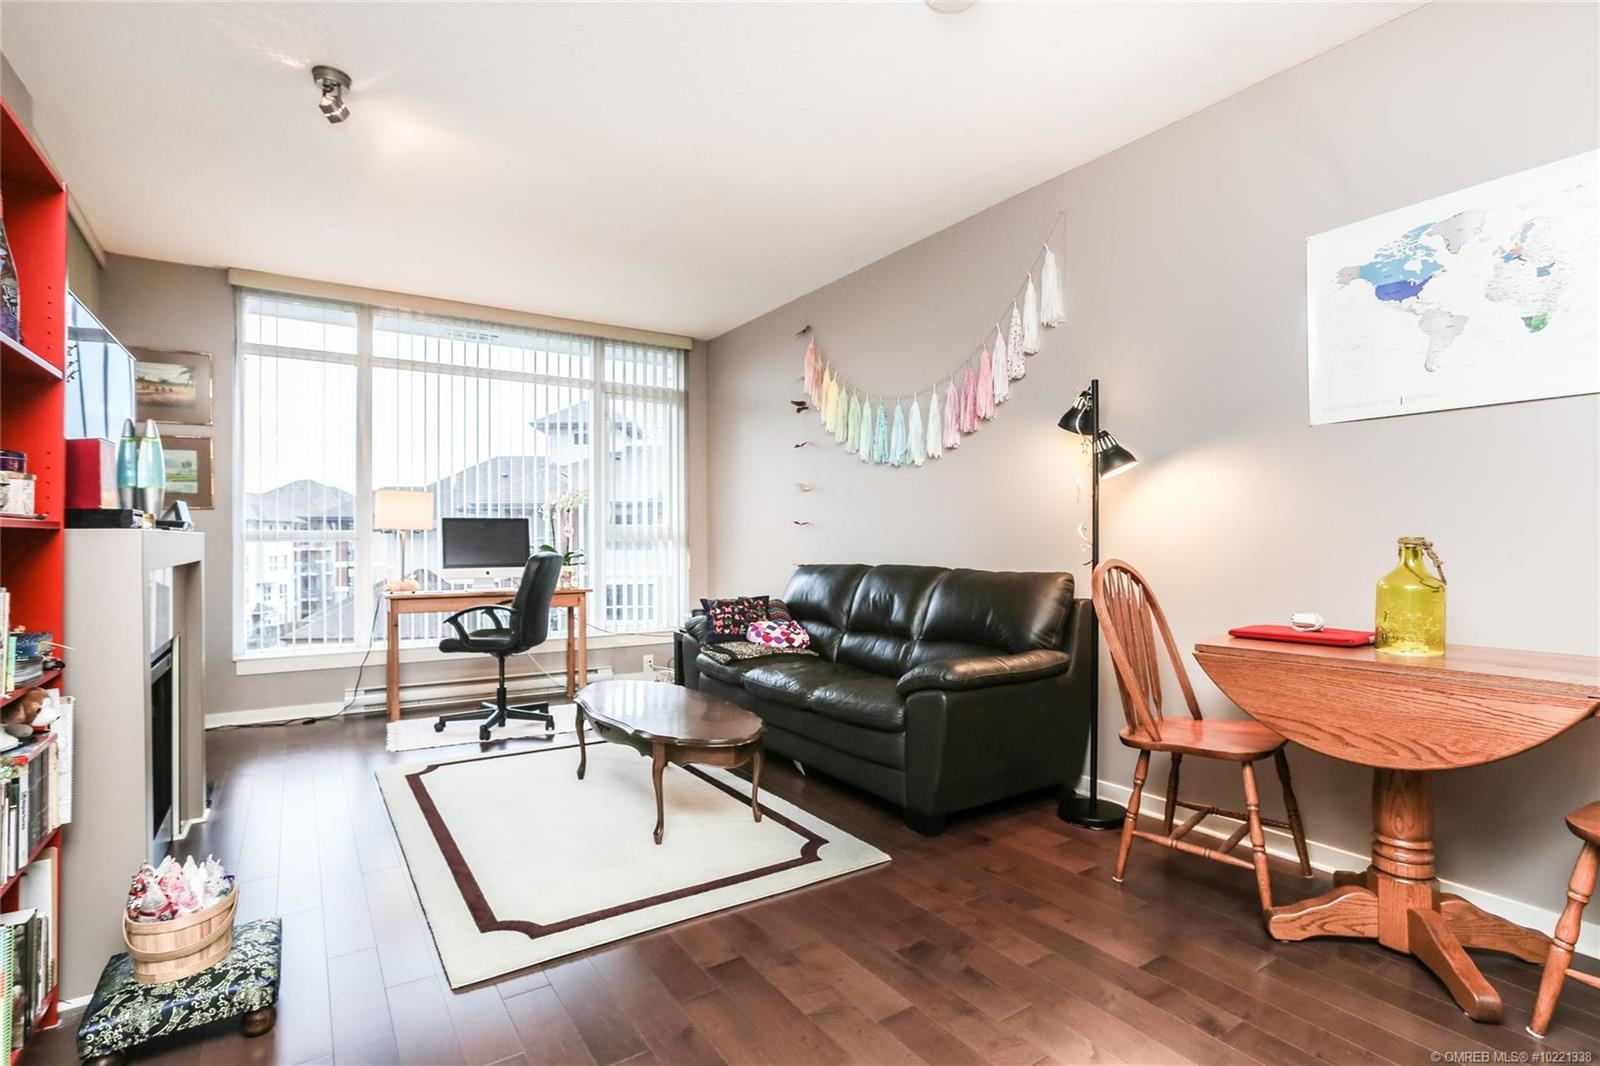 #404 1075 Sunset Drive, - Kelowna Apartment for sale, 1 Bedroom (10221338) - #7